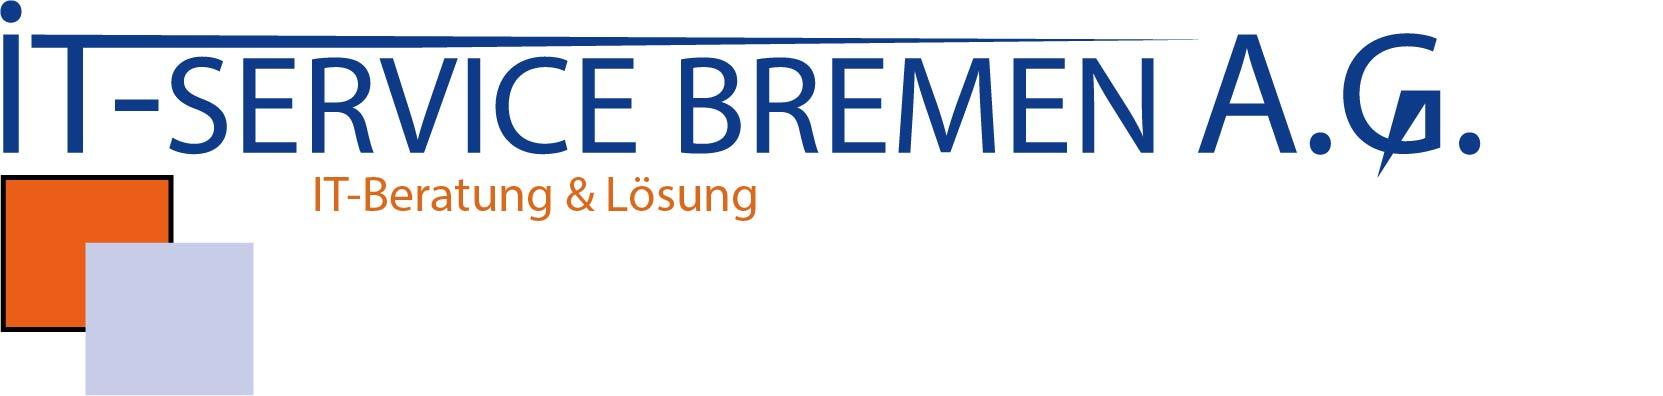 IT-Service-Bremen A.G.